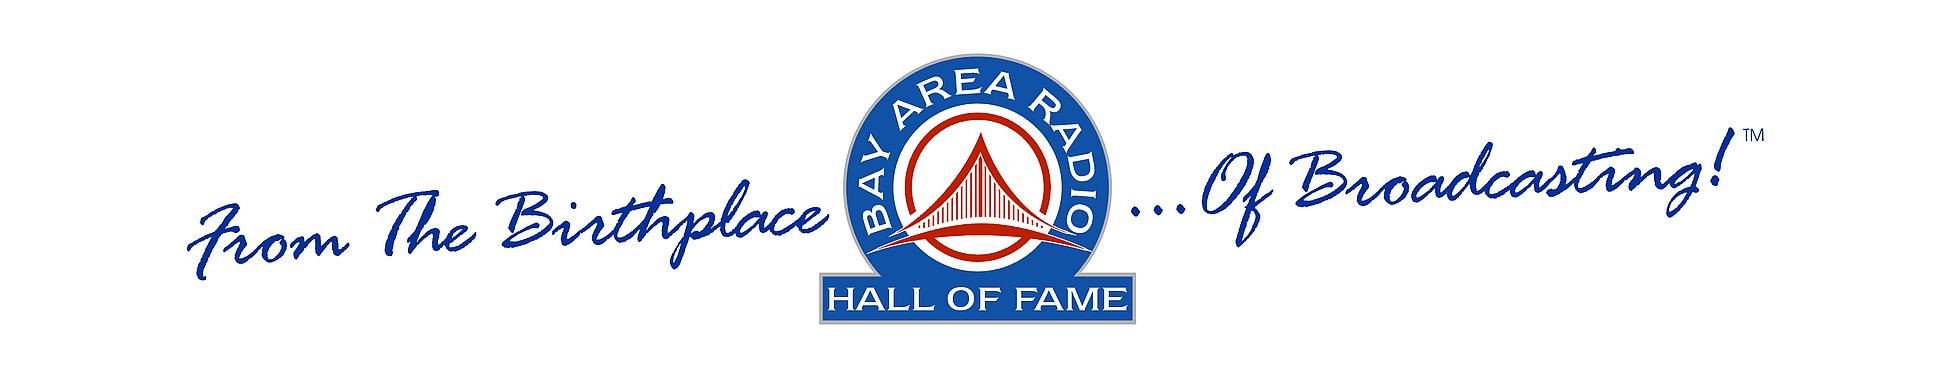 BARHOF Header Logo